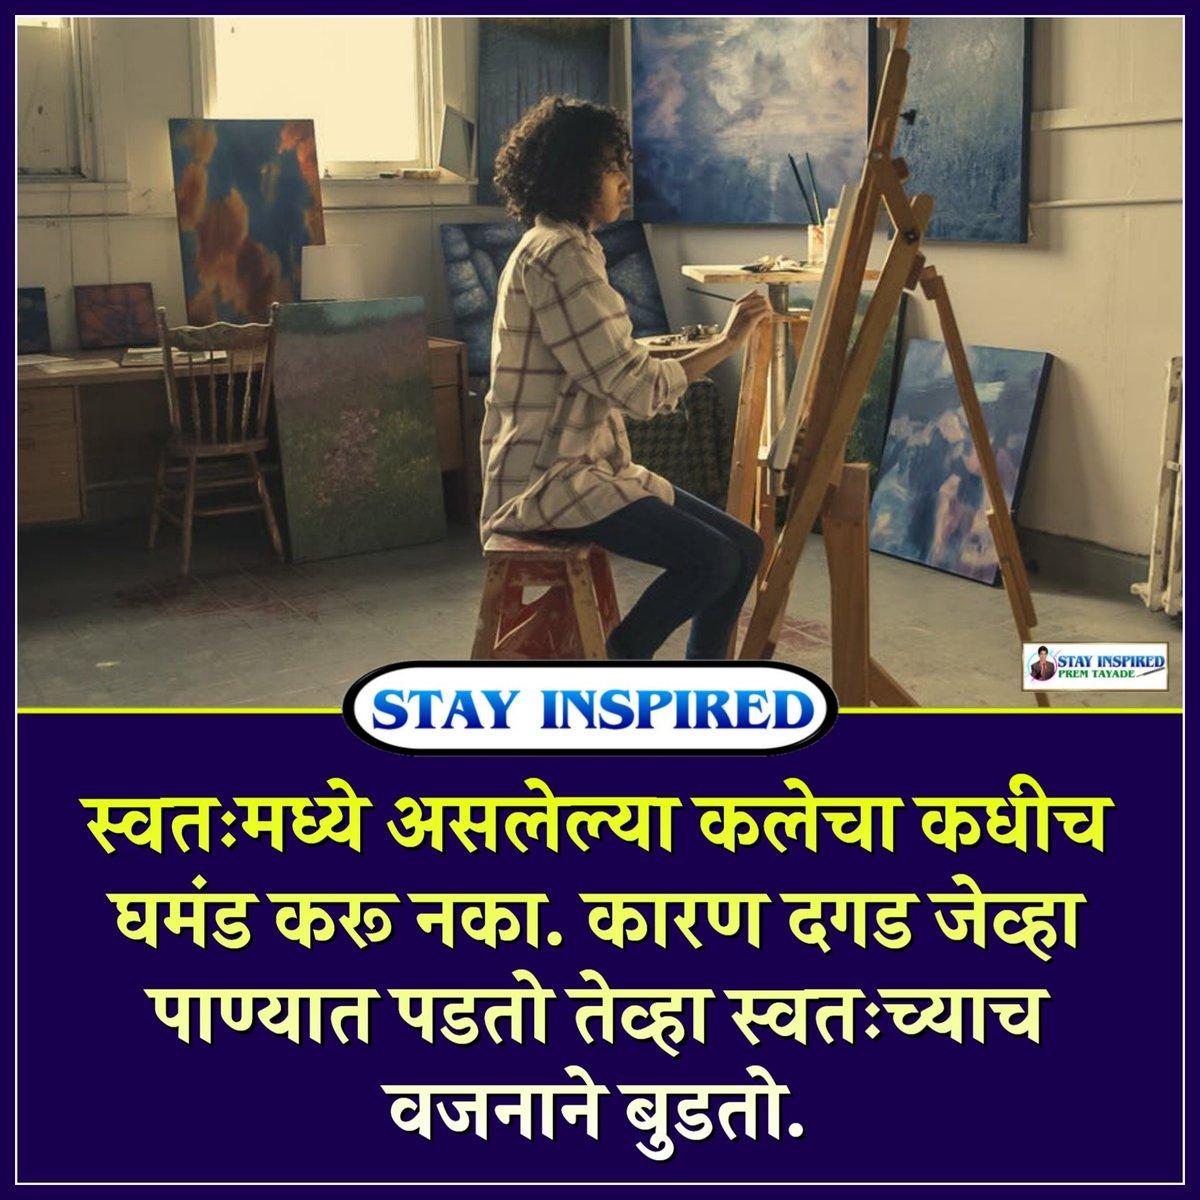 #प्रेरणादायी #प्रेरणादायक #सुविचार  #marathimotivation #marathi #marathistatus #marathimotivational #marathiinspirations #marathisuvichar #marathivichar #motivationmarathi #stayinspiredmarathi #inspiration #marathithoughts #success #inspirationalquotes #motivationalquotes #मराठीpic.twitter.com/FXonevFItJ